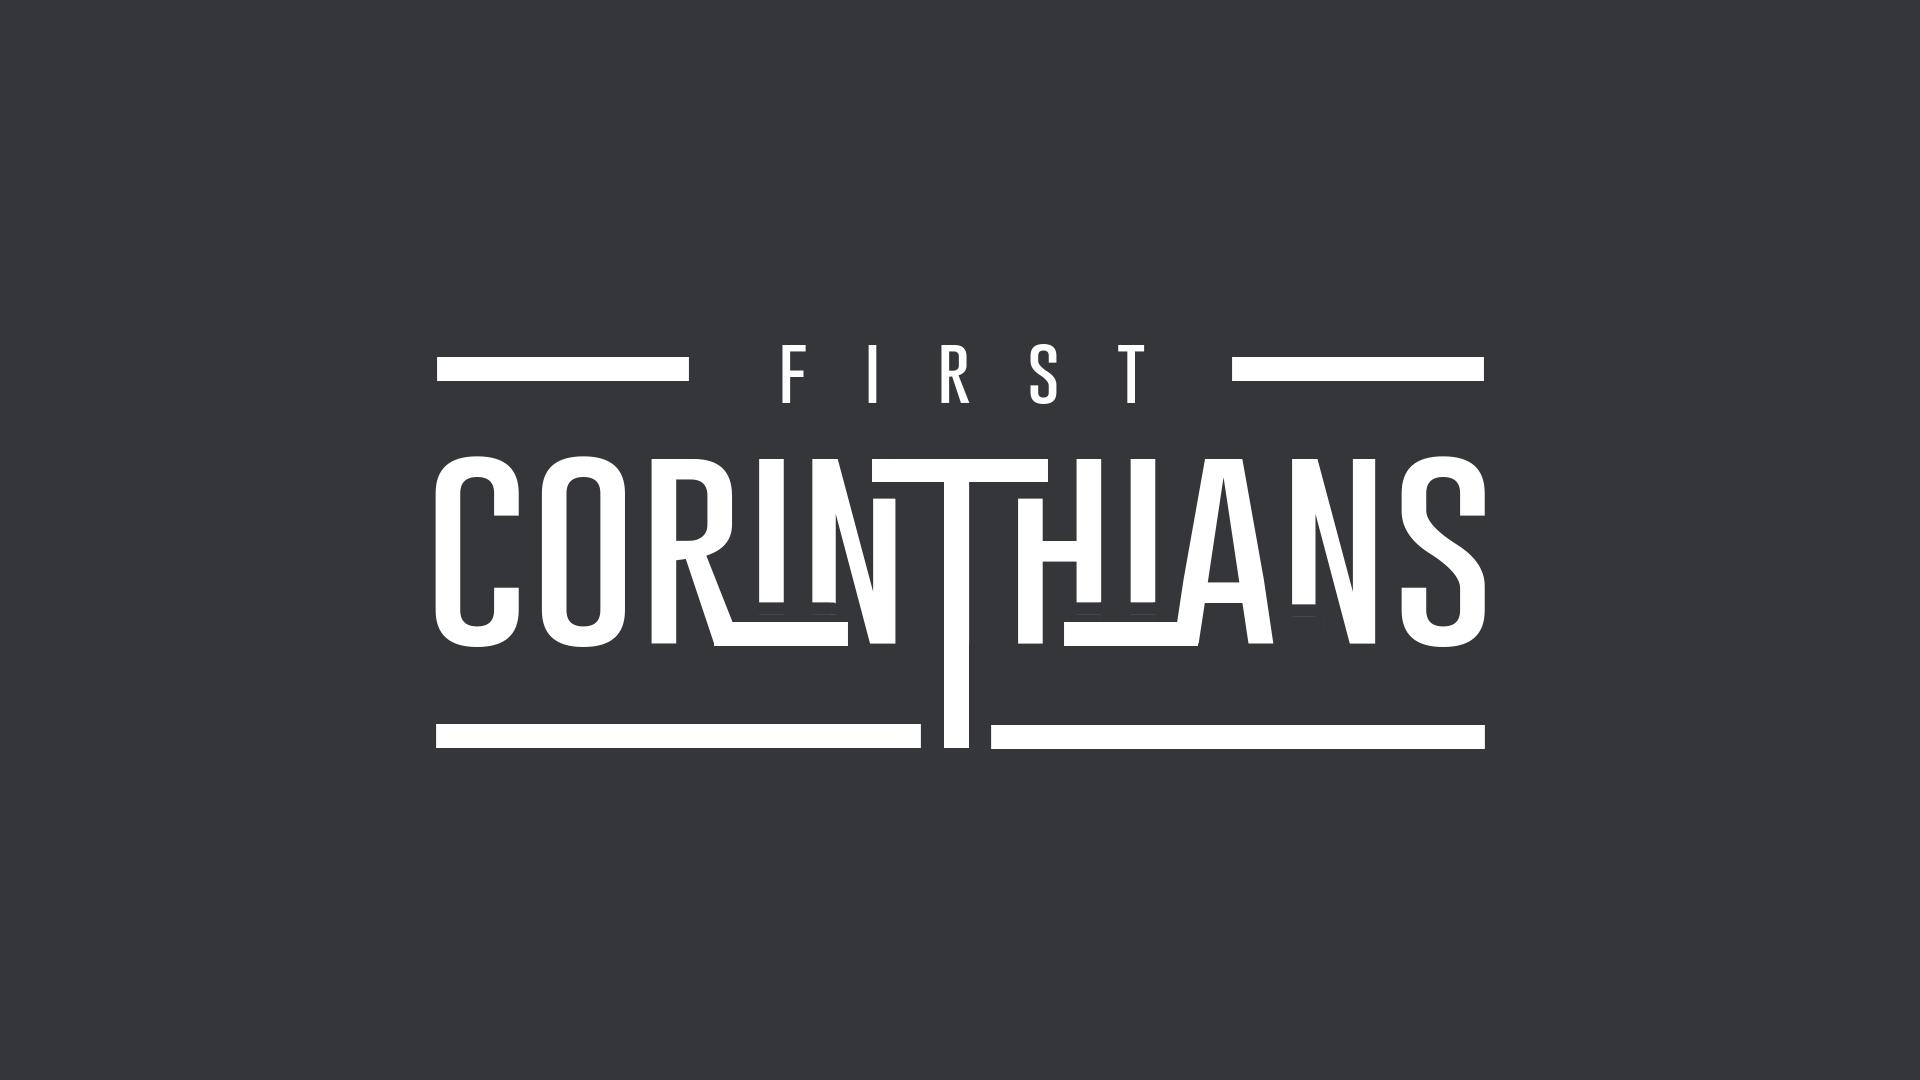 Copy of Redeemer 1 Corinthians image